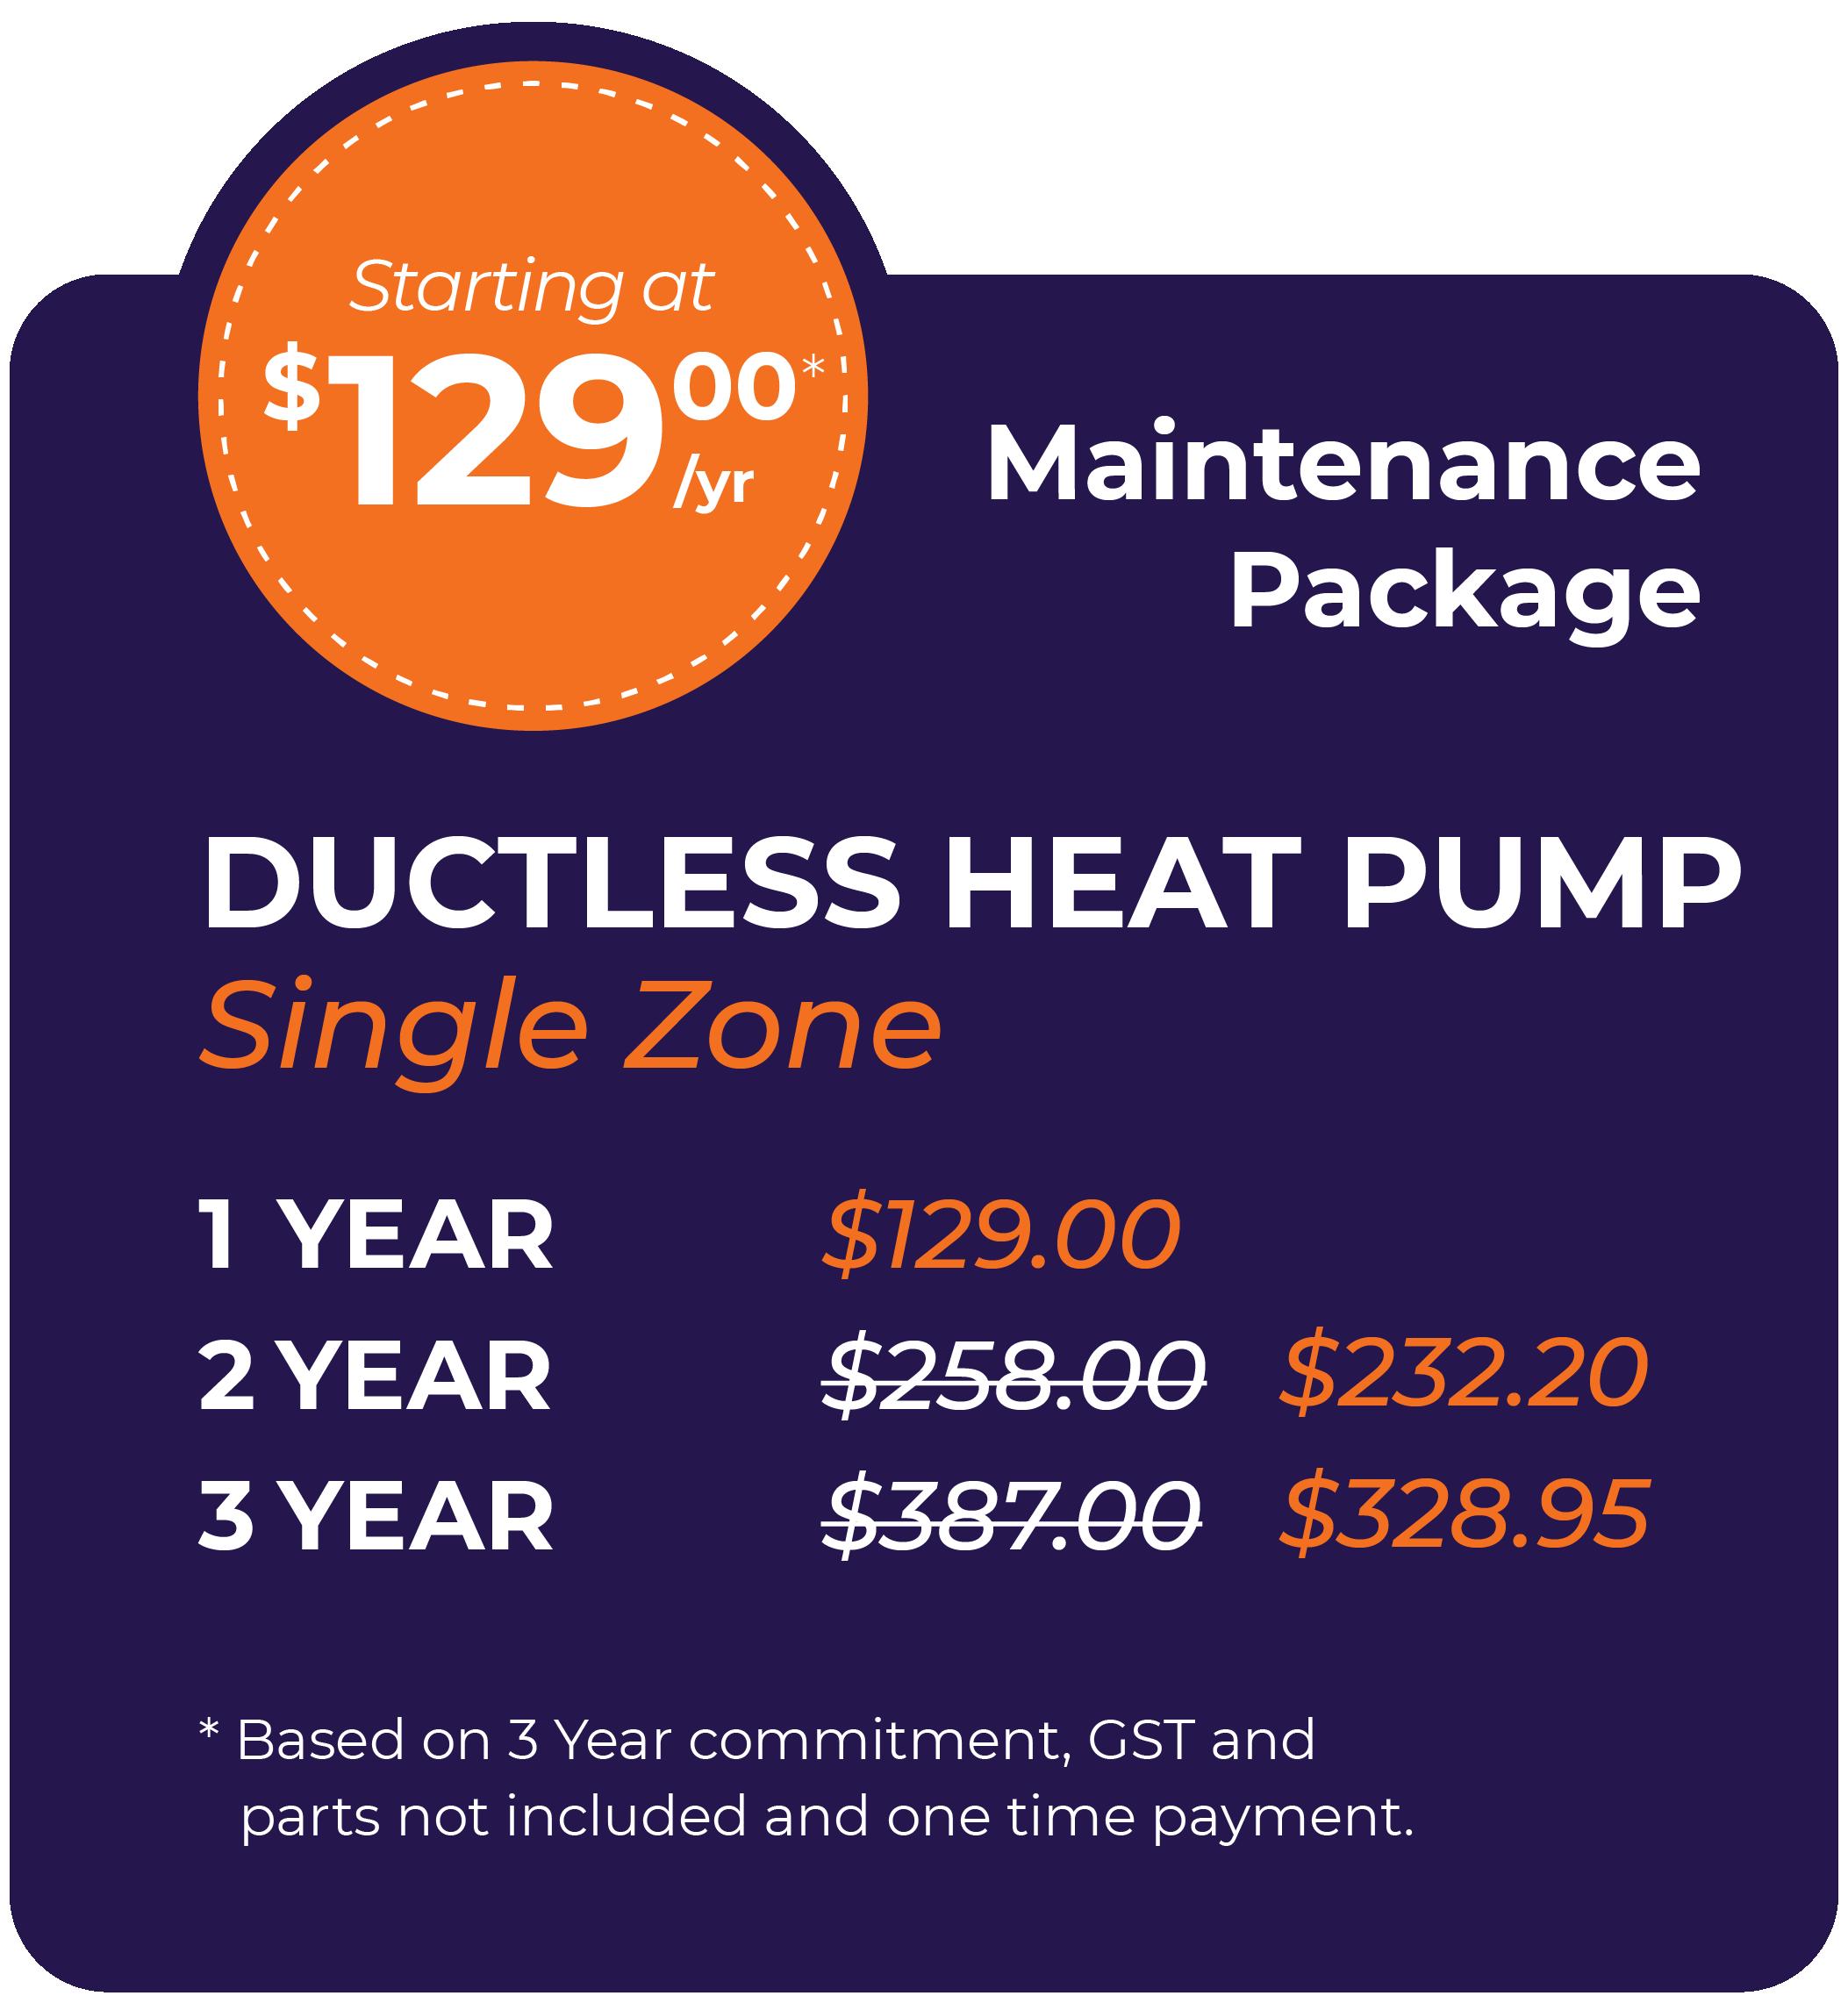 Ductless Heat Pump Single Zone Maintenance Package